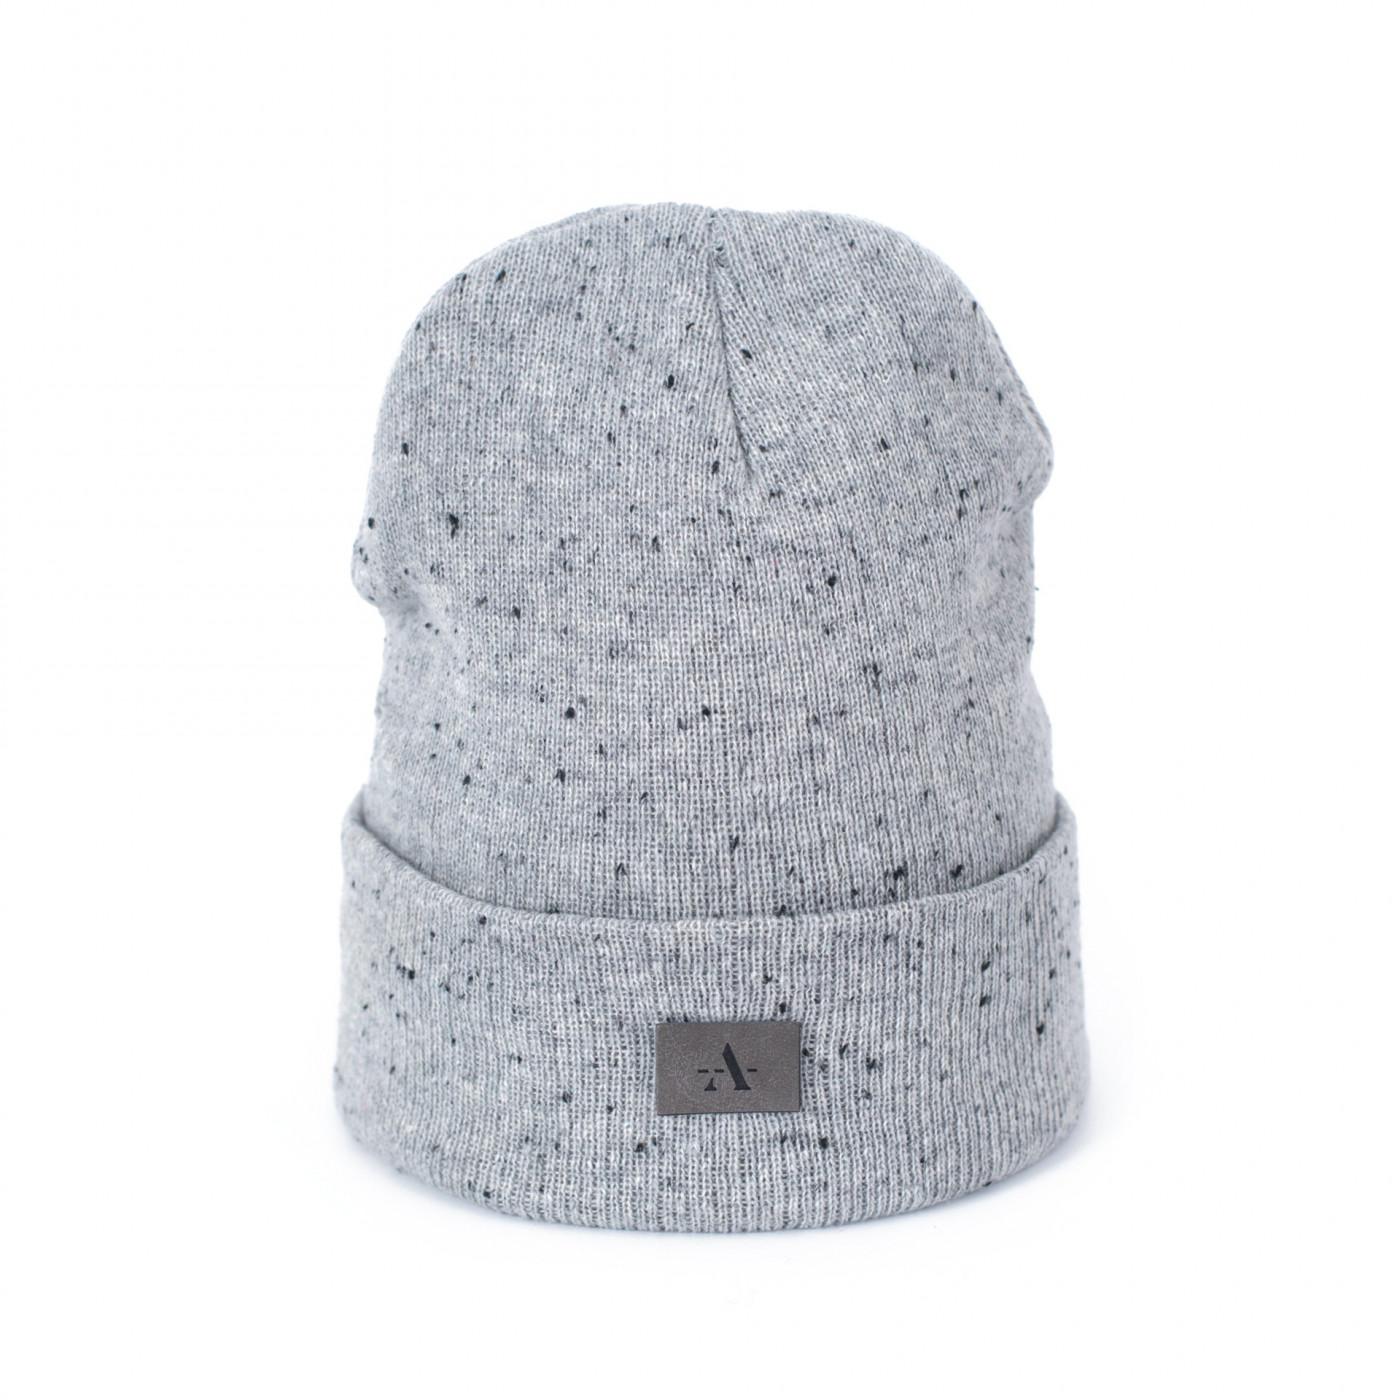 Art Of Polo Unisex's Hat cz18376 Light